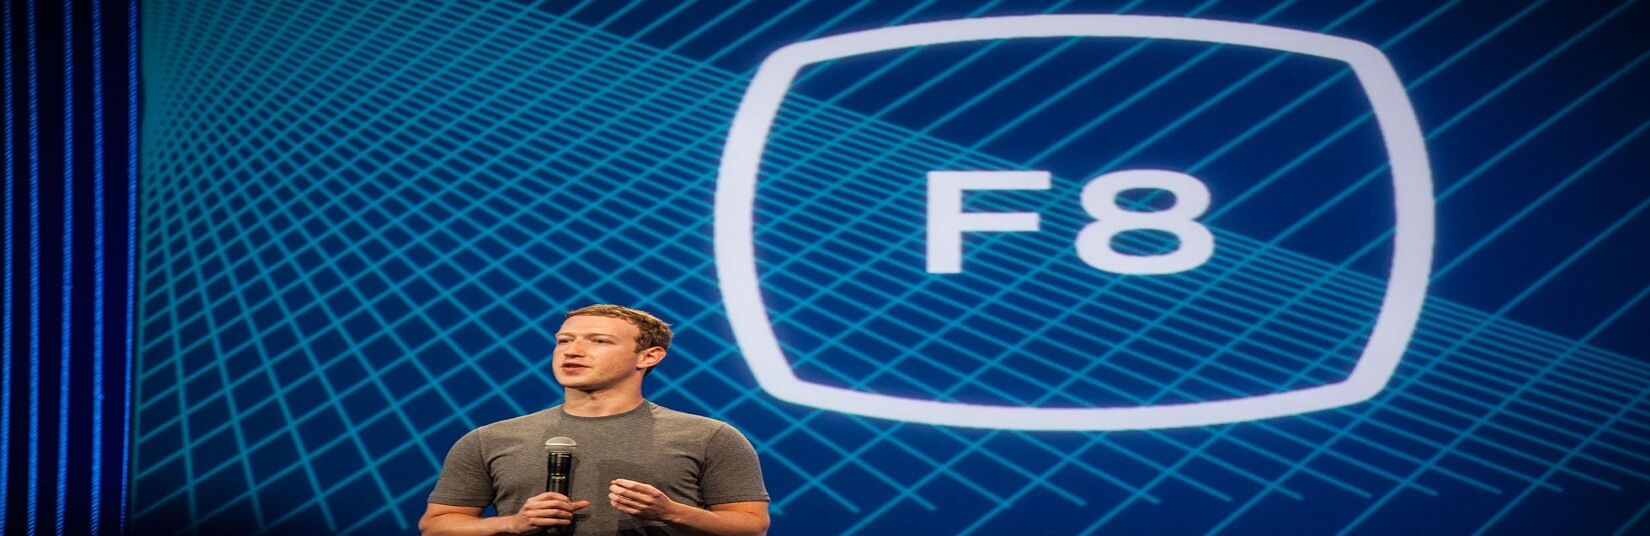 use-facebook-f8-mark-zuckerberg-Letsnurture